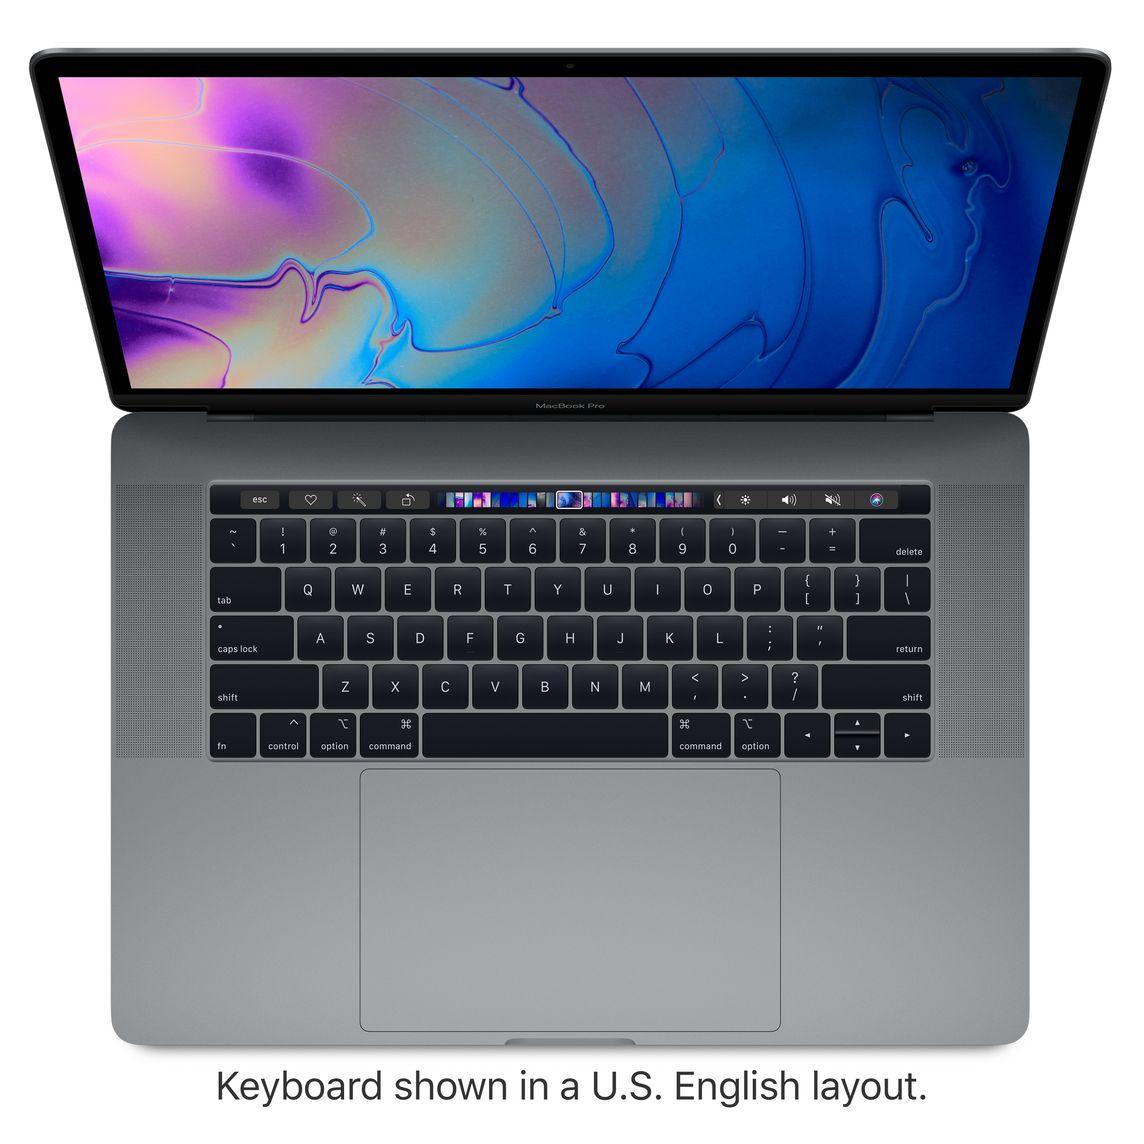 Refurbished 15.4 inch MacBook Pro 2.9GHz 6 core Intel Core i9 with Retina display and Radeon Pro Vega 20 Space Gray